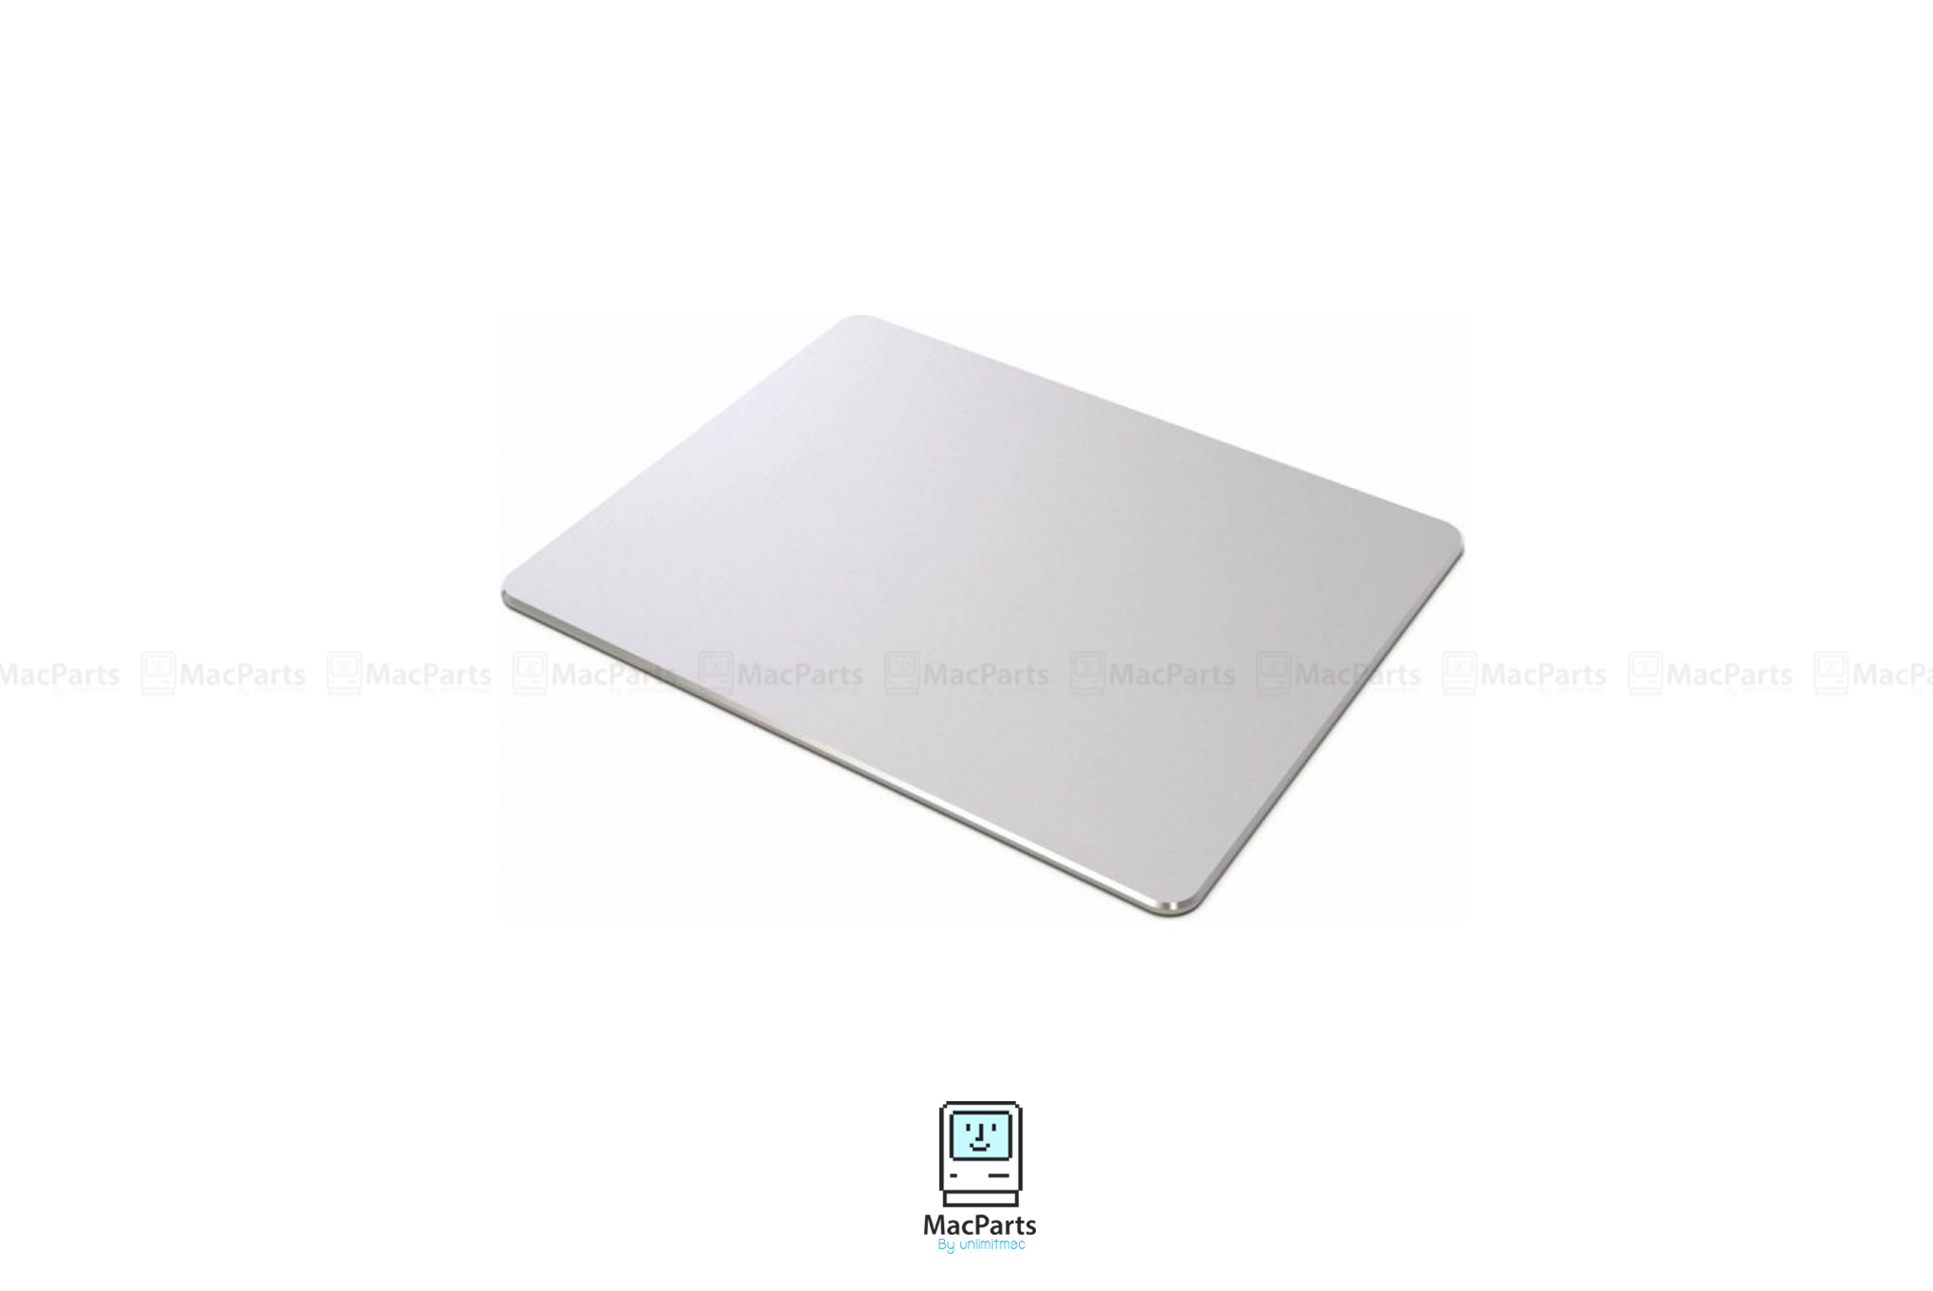 Mouse Pad Aluminum Silver แผ่นรองเมาส์ อลูมิเนียม